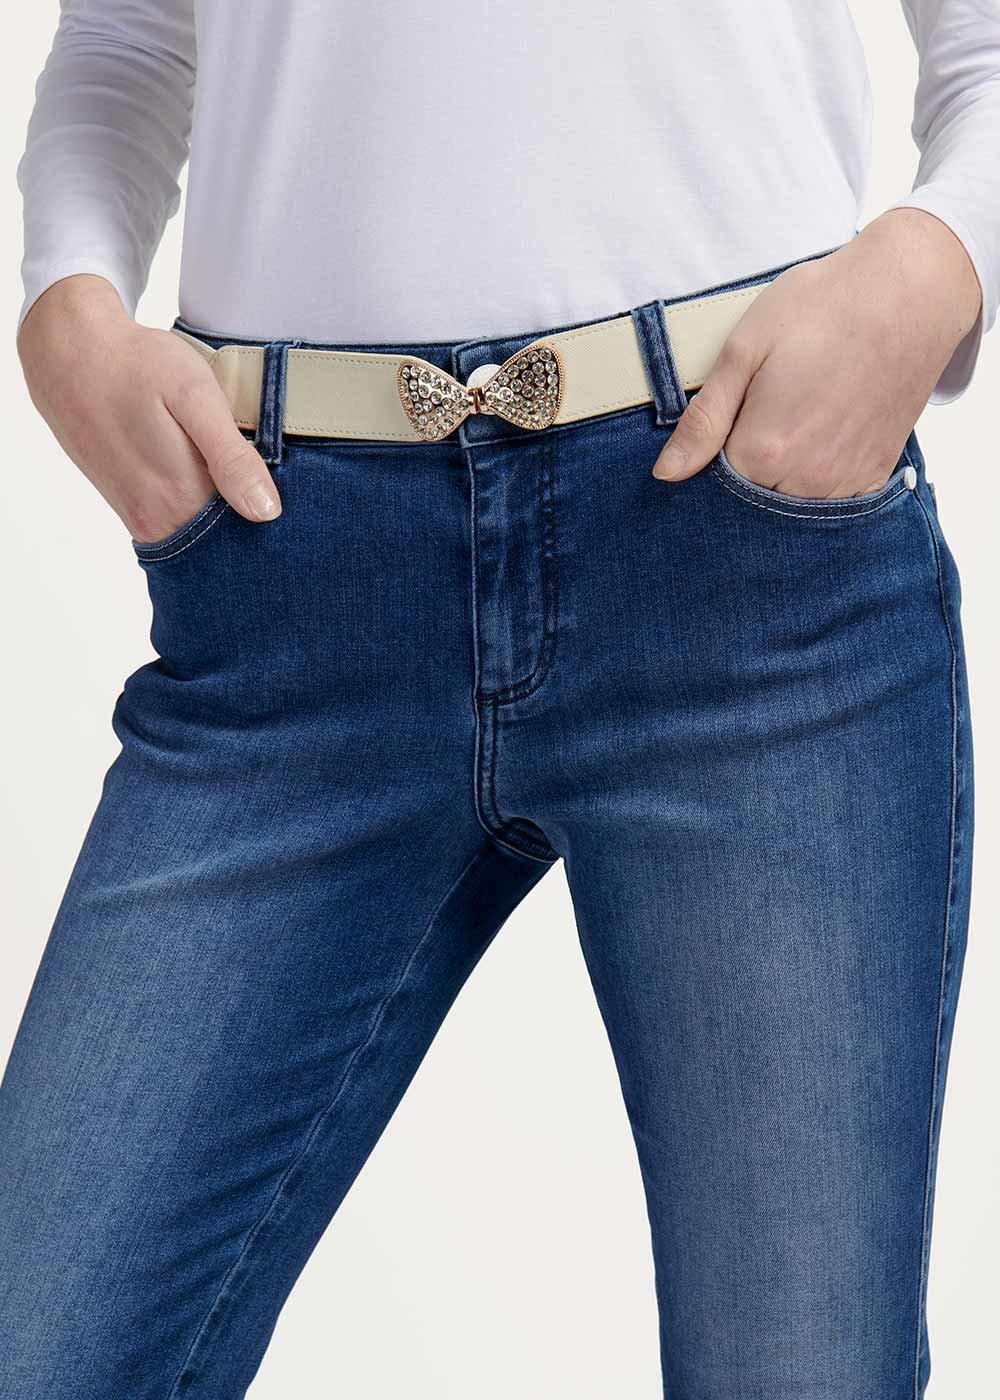 Cintura elastica Cindy con fiocco - Light Beige - Donna